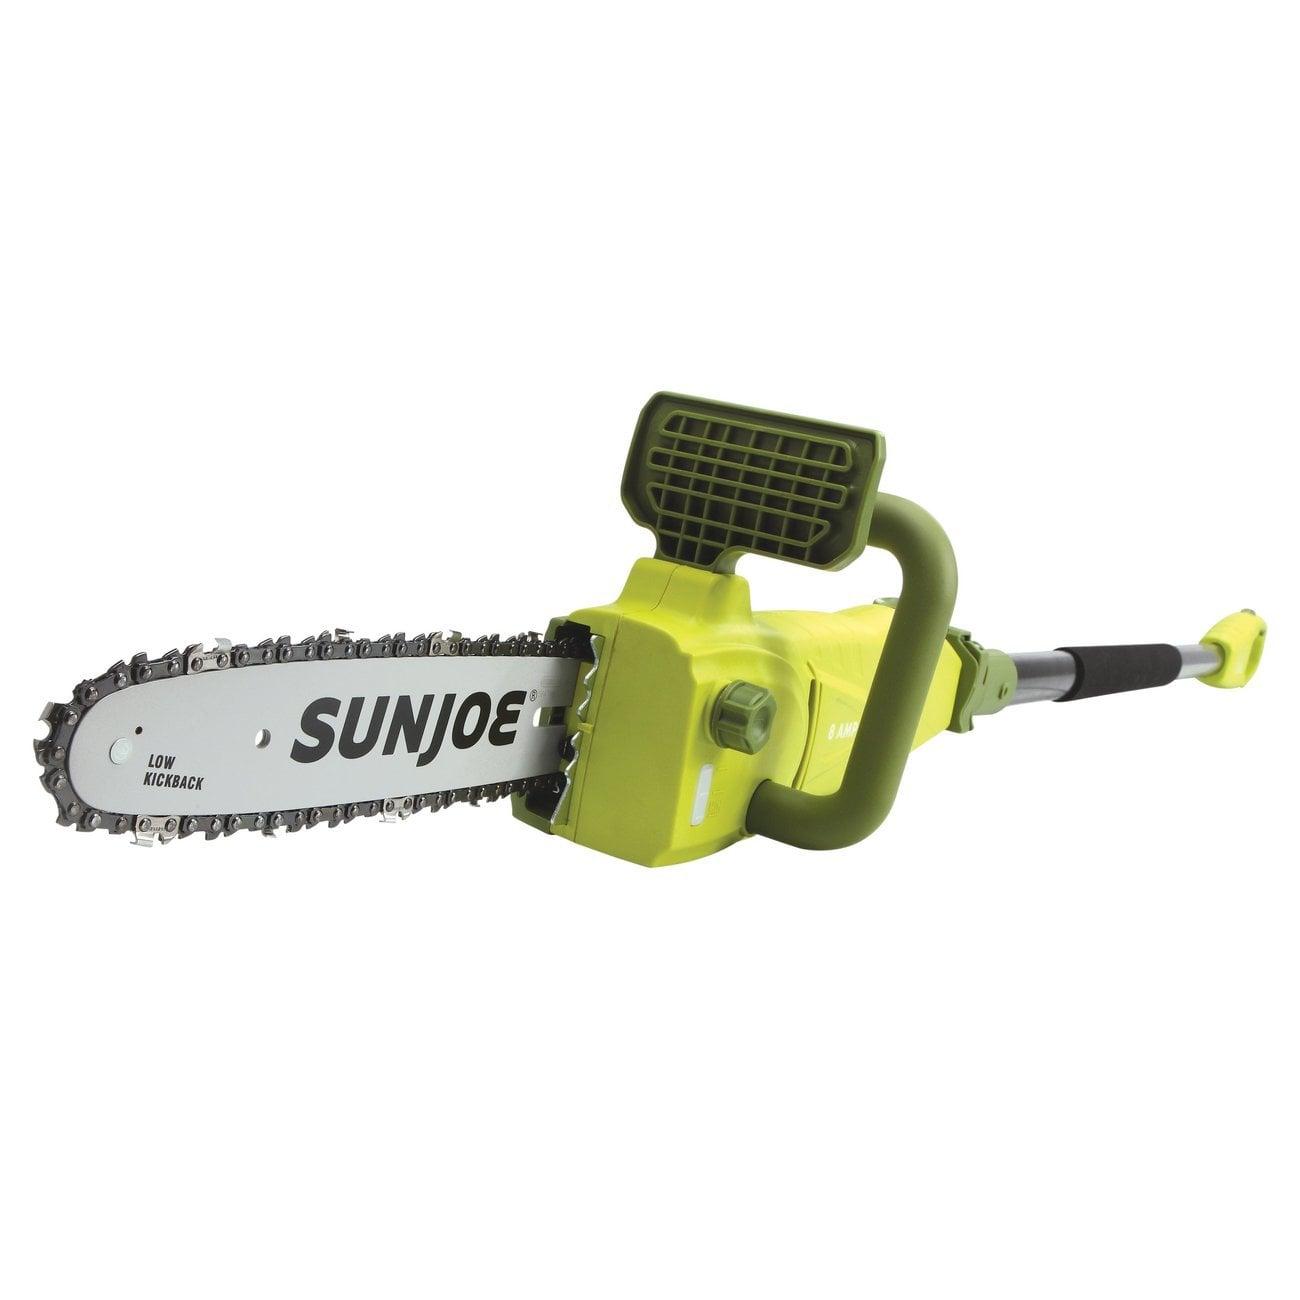 "Sun Joe SWJ807E 10"" 8-Amp Electric Convertible Pole/Chain Saw"